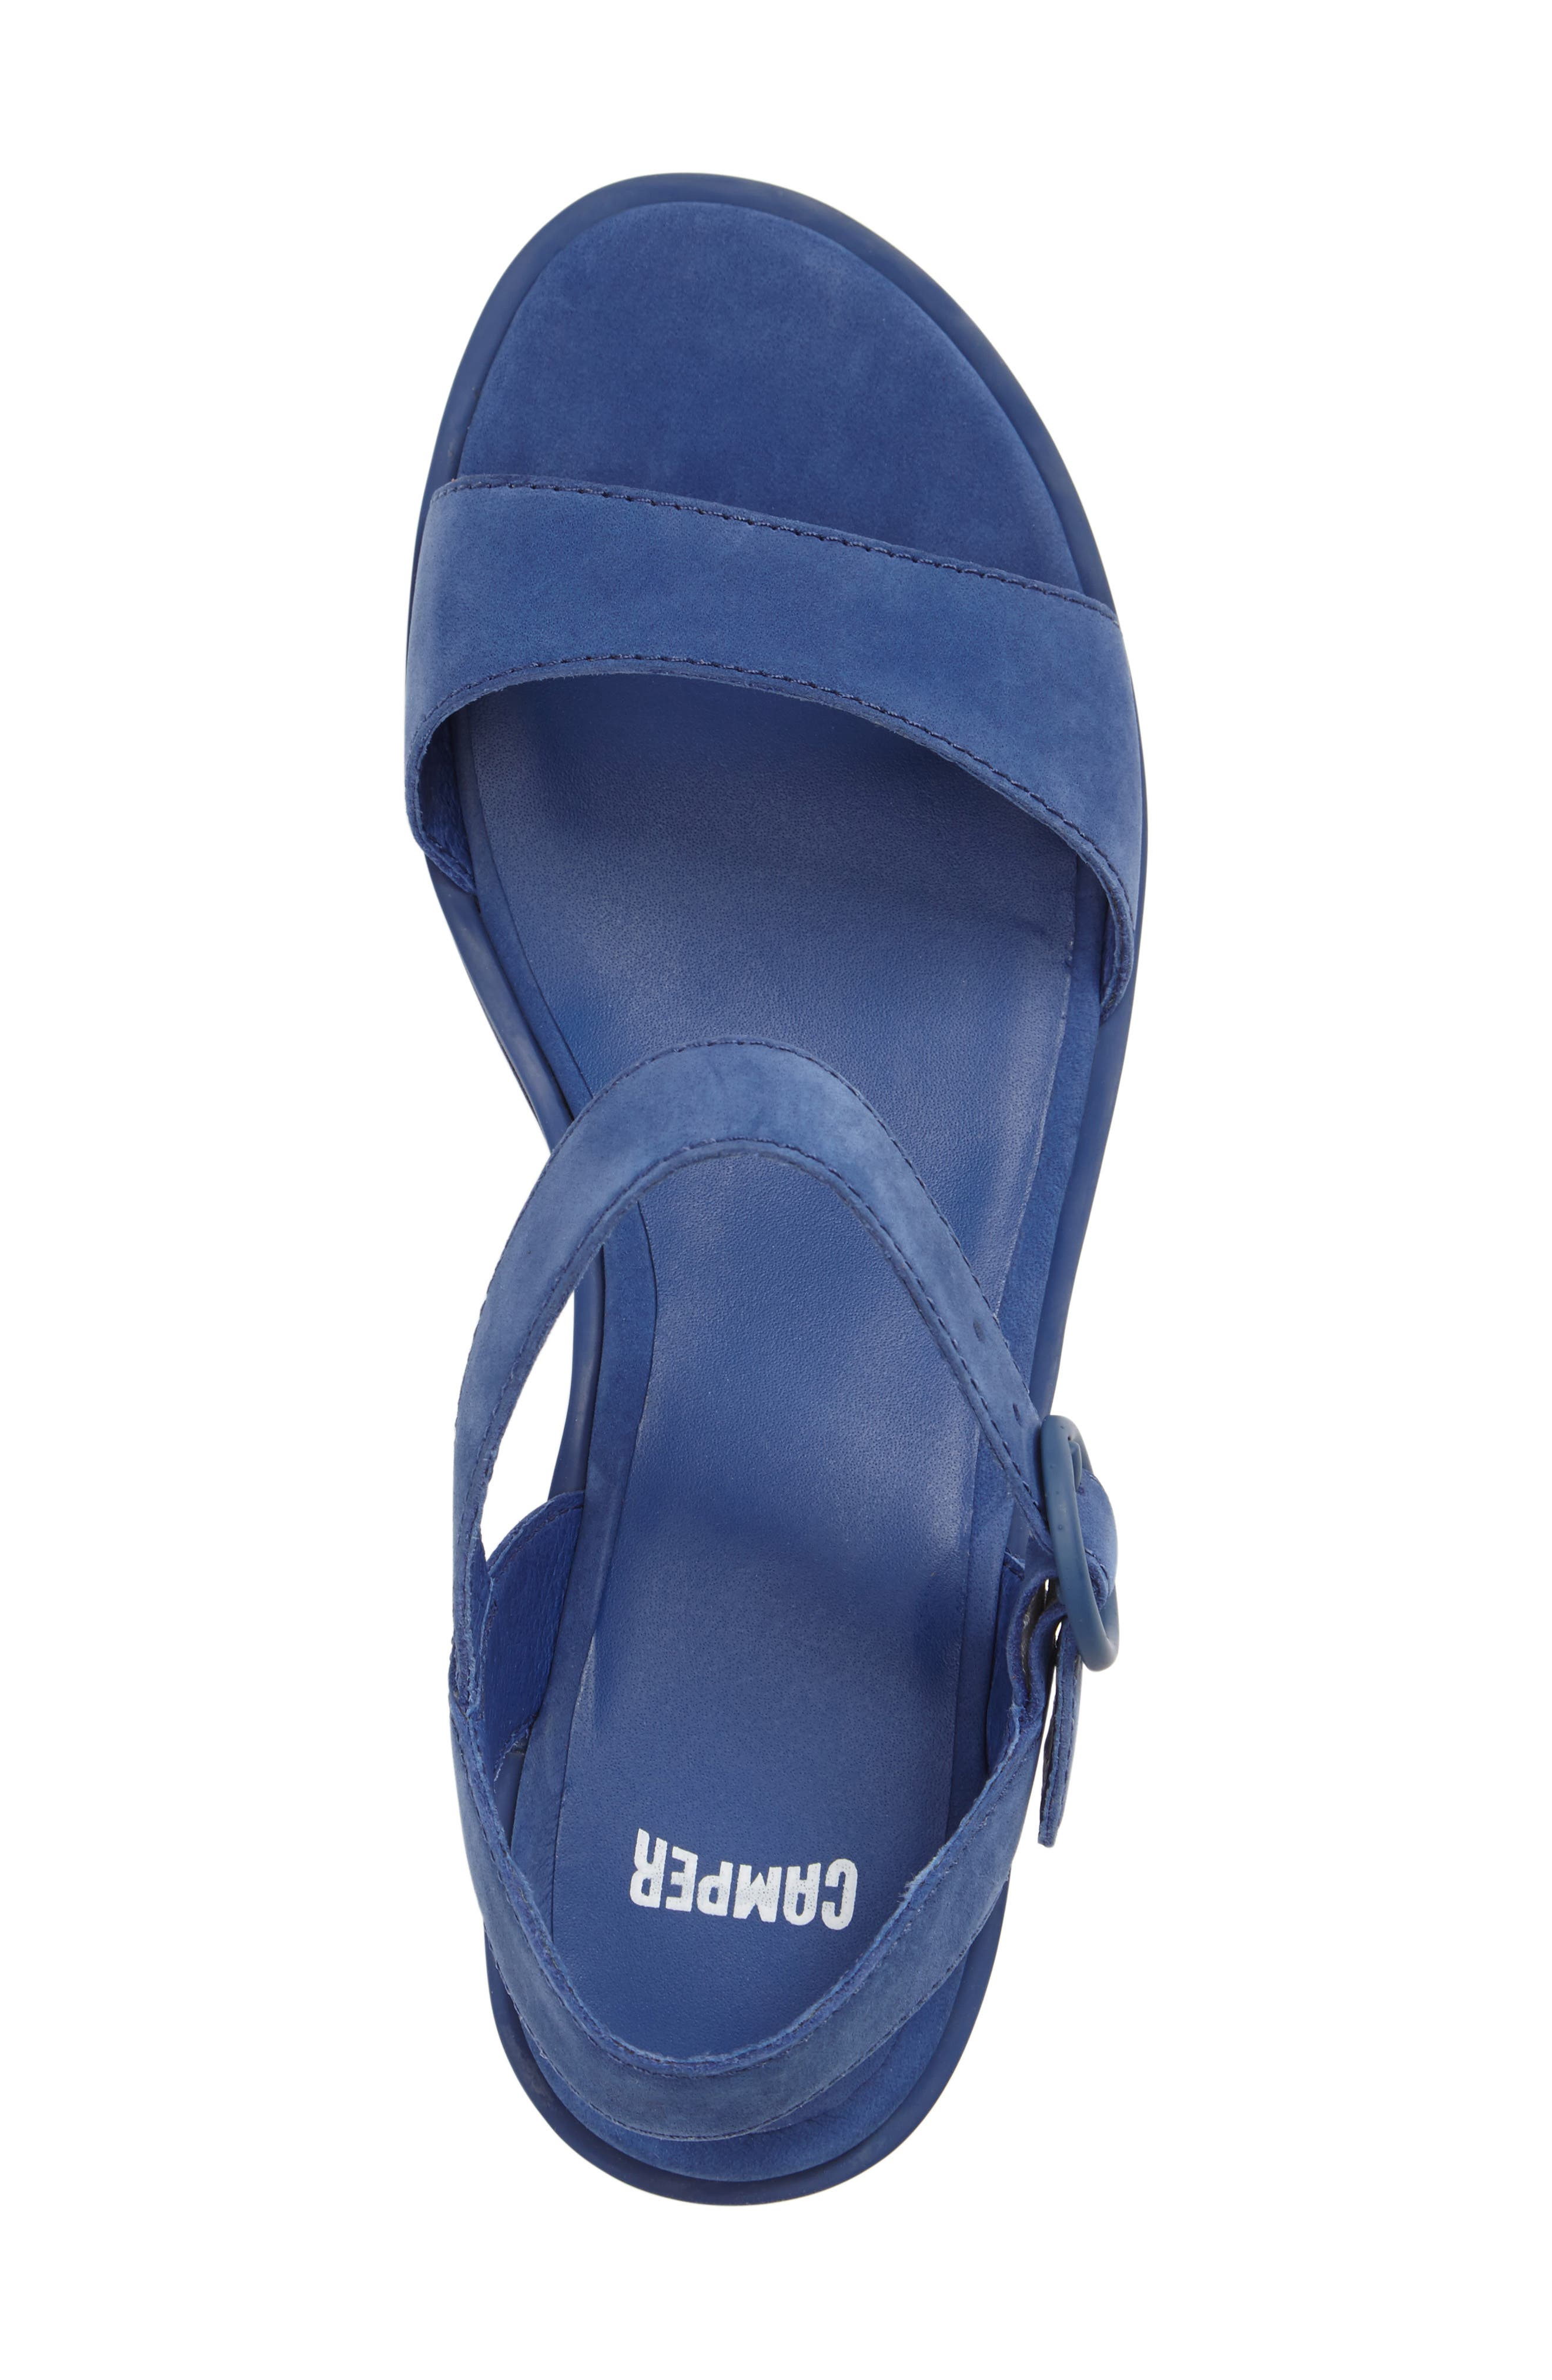 'Damas' Wedge Sandal,                             Alternate thumbnail 34, color,